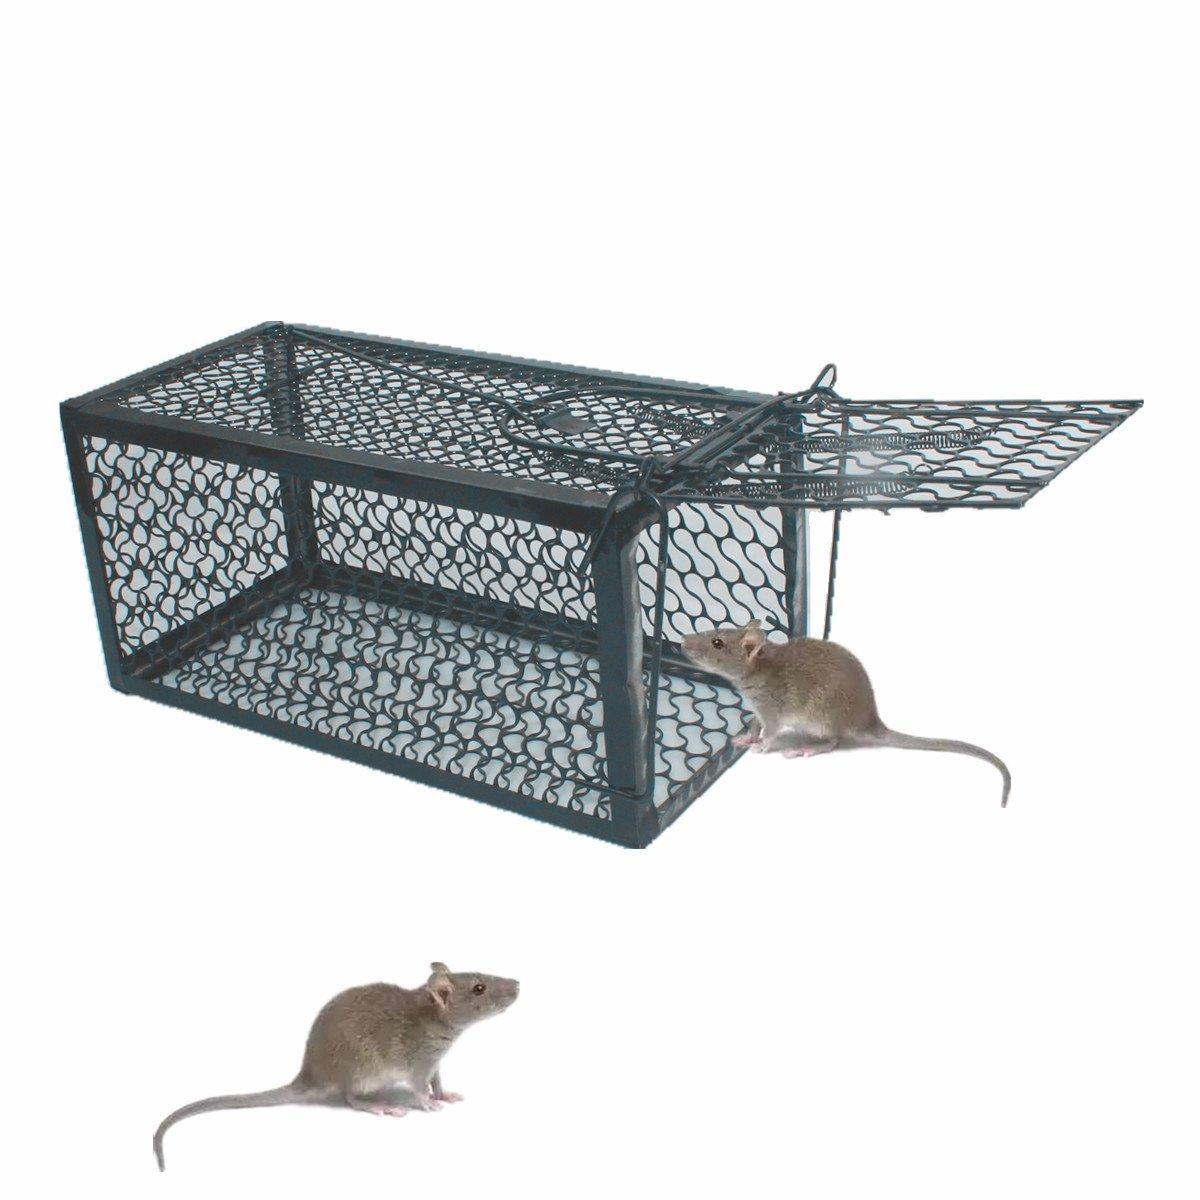 TIFANTI ratón Hierro Jaula Trampa, Humano para ratón, Ratas, Hamster, Topo,